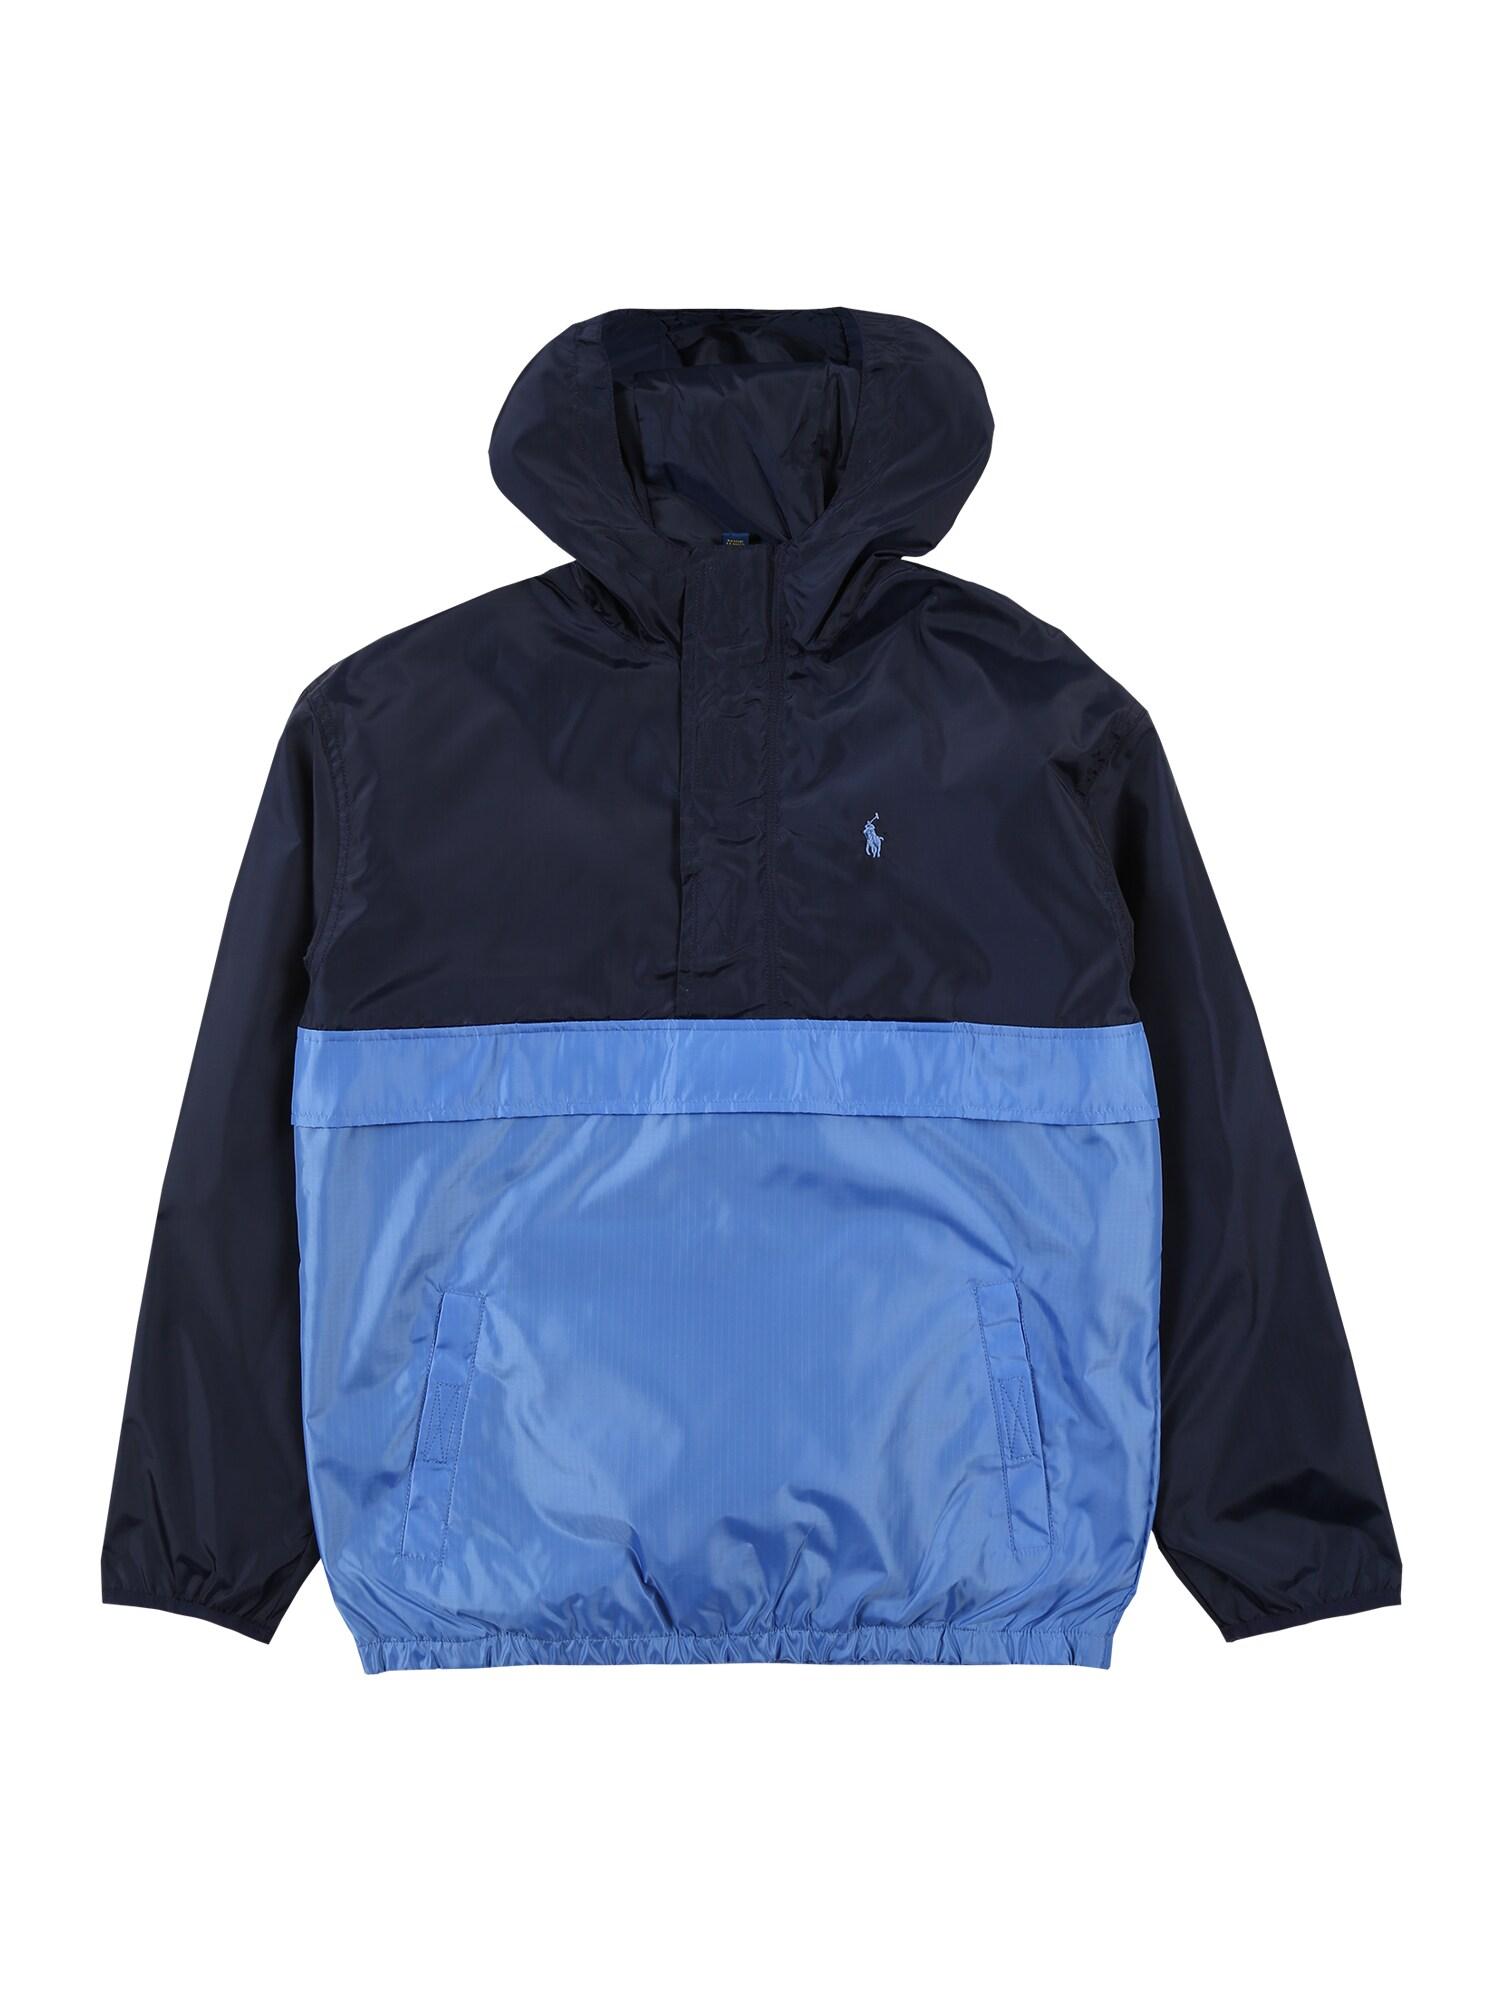 POLO RALPH LAUREN Demisezoninė striukė tamsiai mėlyna / mėlyna dūmų spalva